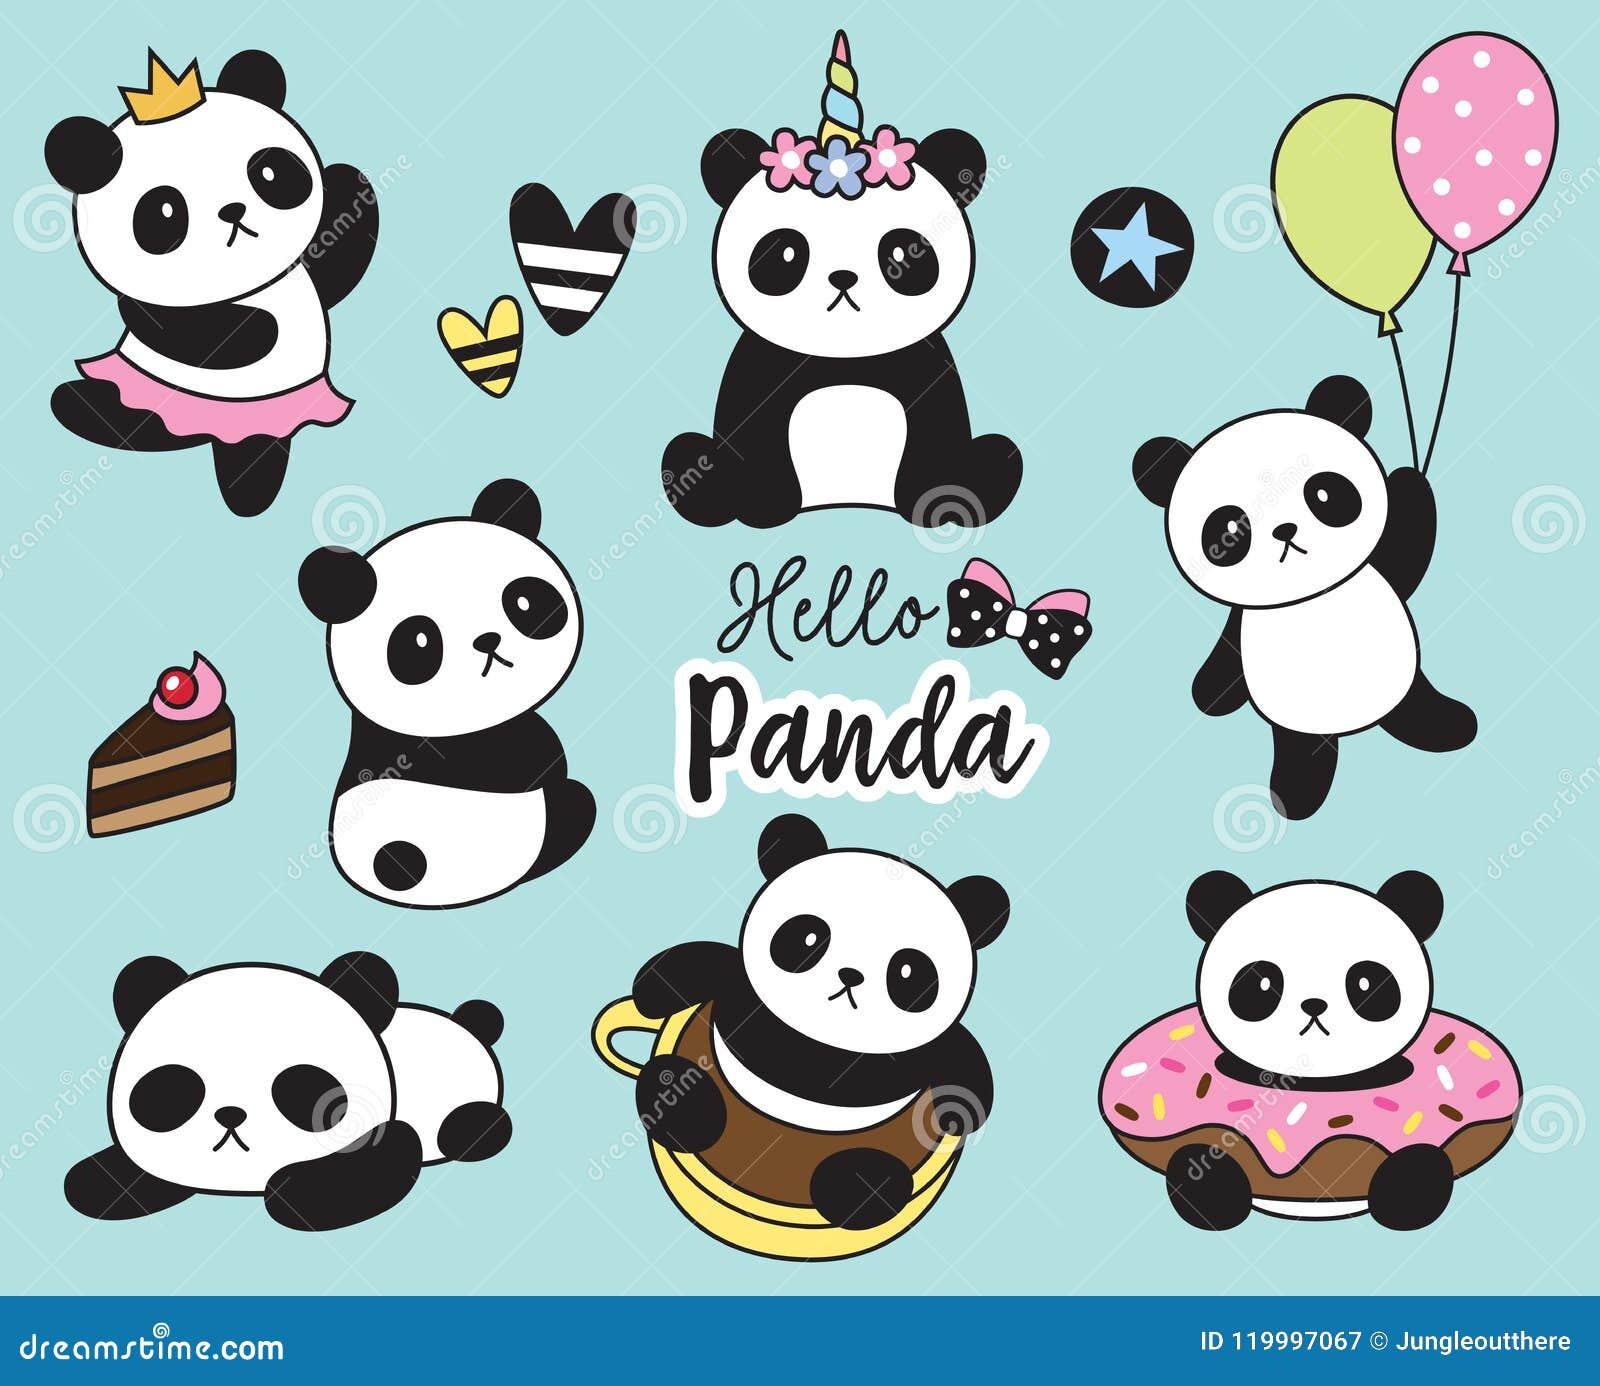 Cute Baby Panda Vector Illustration Stock Vector Illustration Of Panda Illustration 119997067